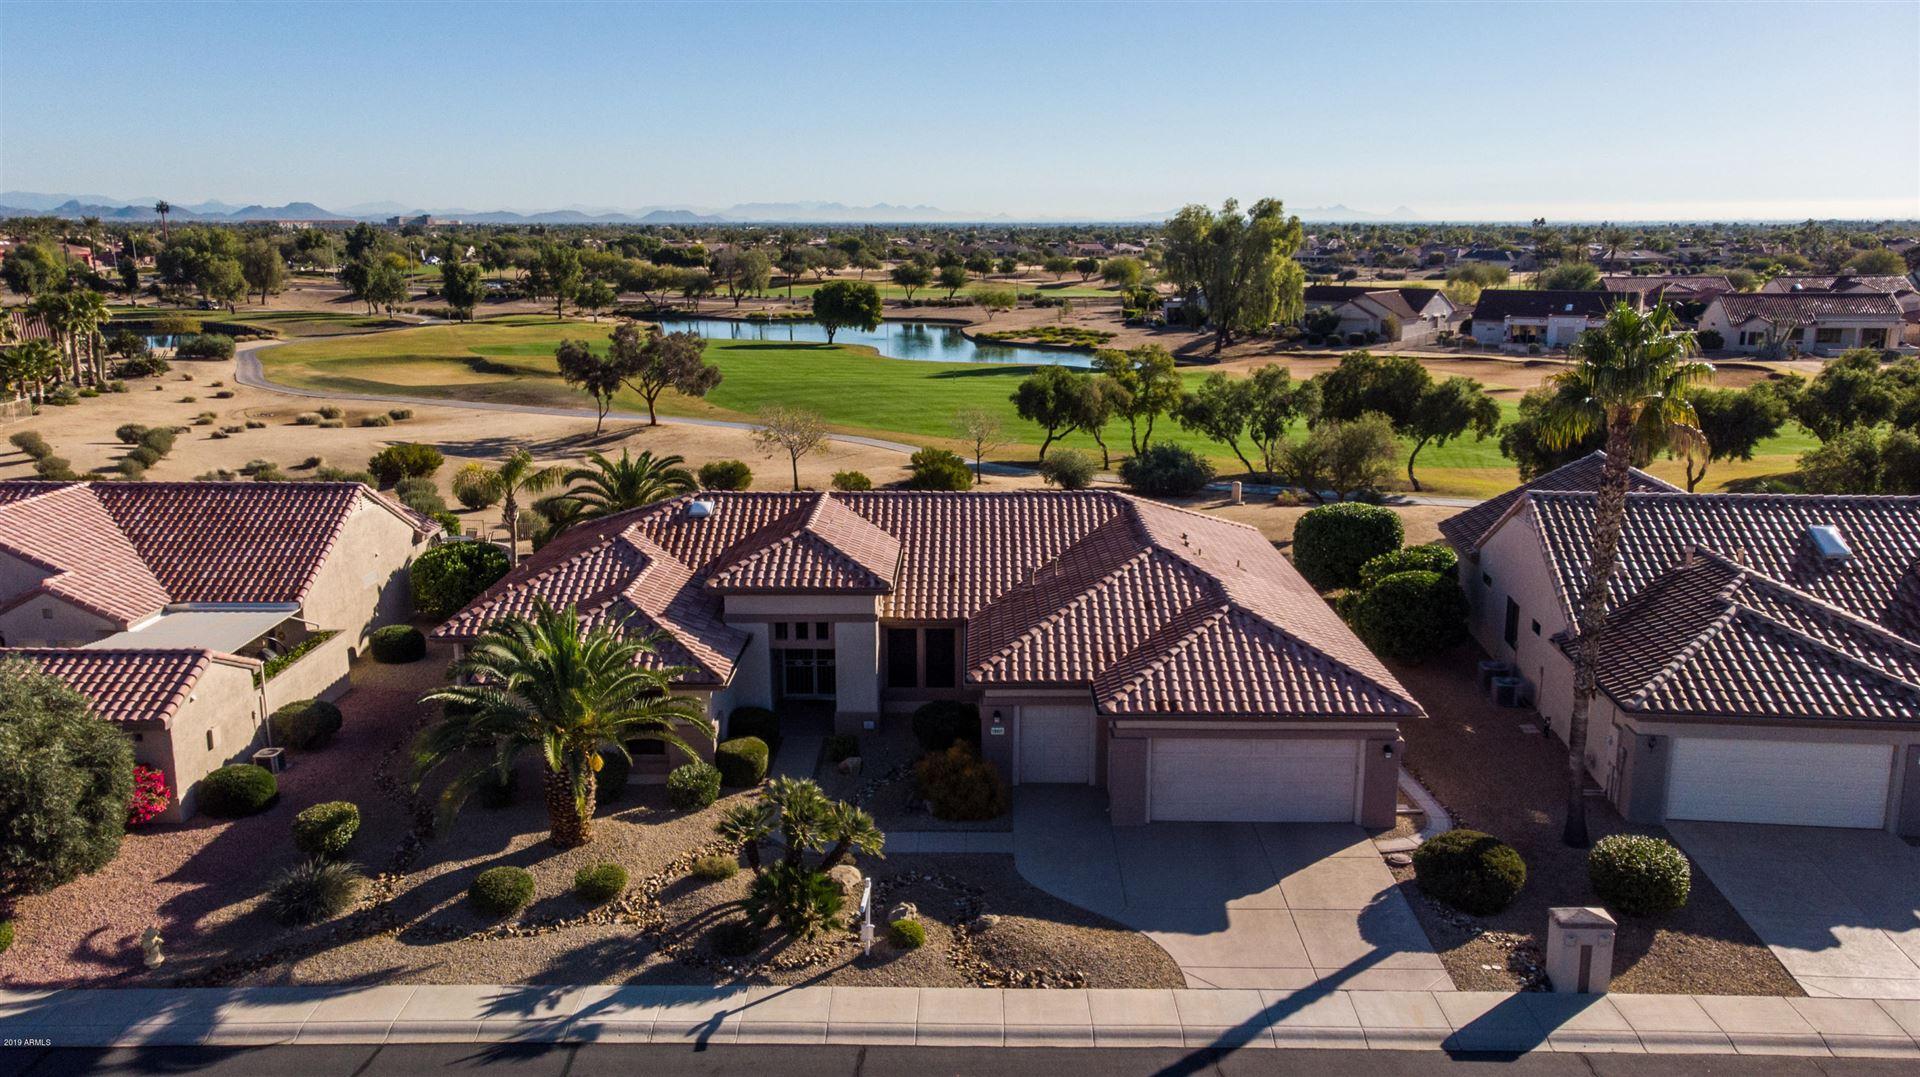 18421 N Laguna Azul Drive, Surprise, AZ 85374 - MLS#: 6014426